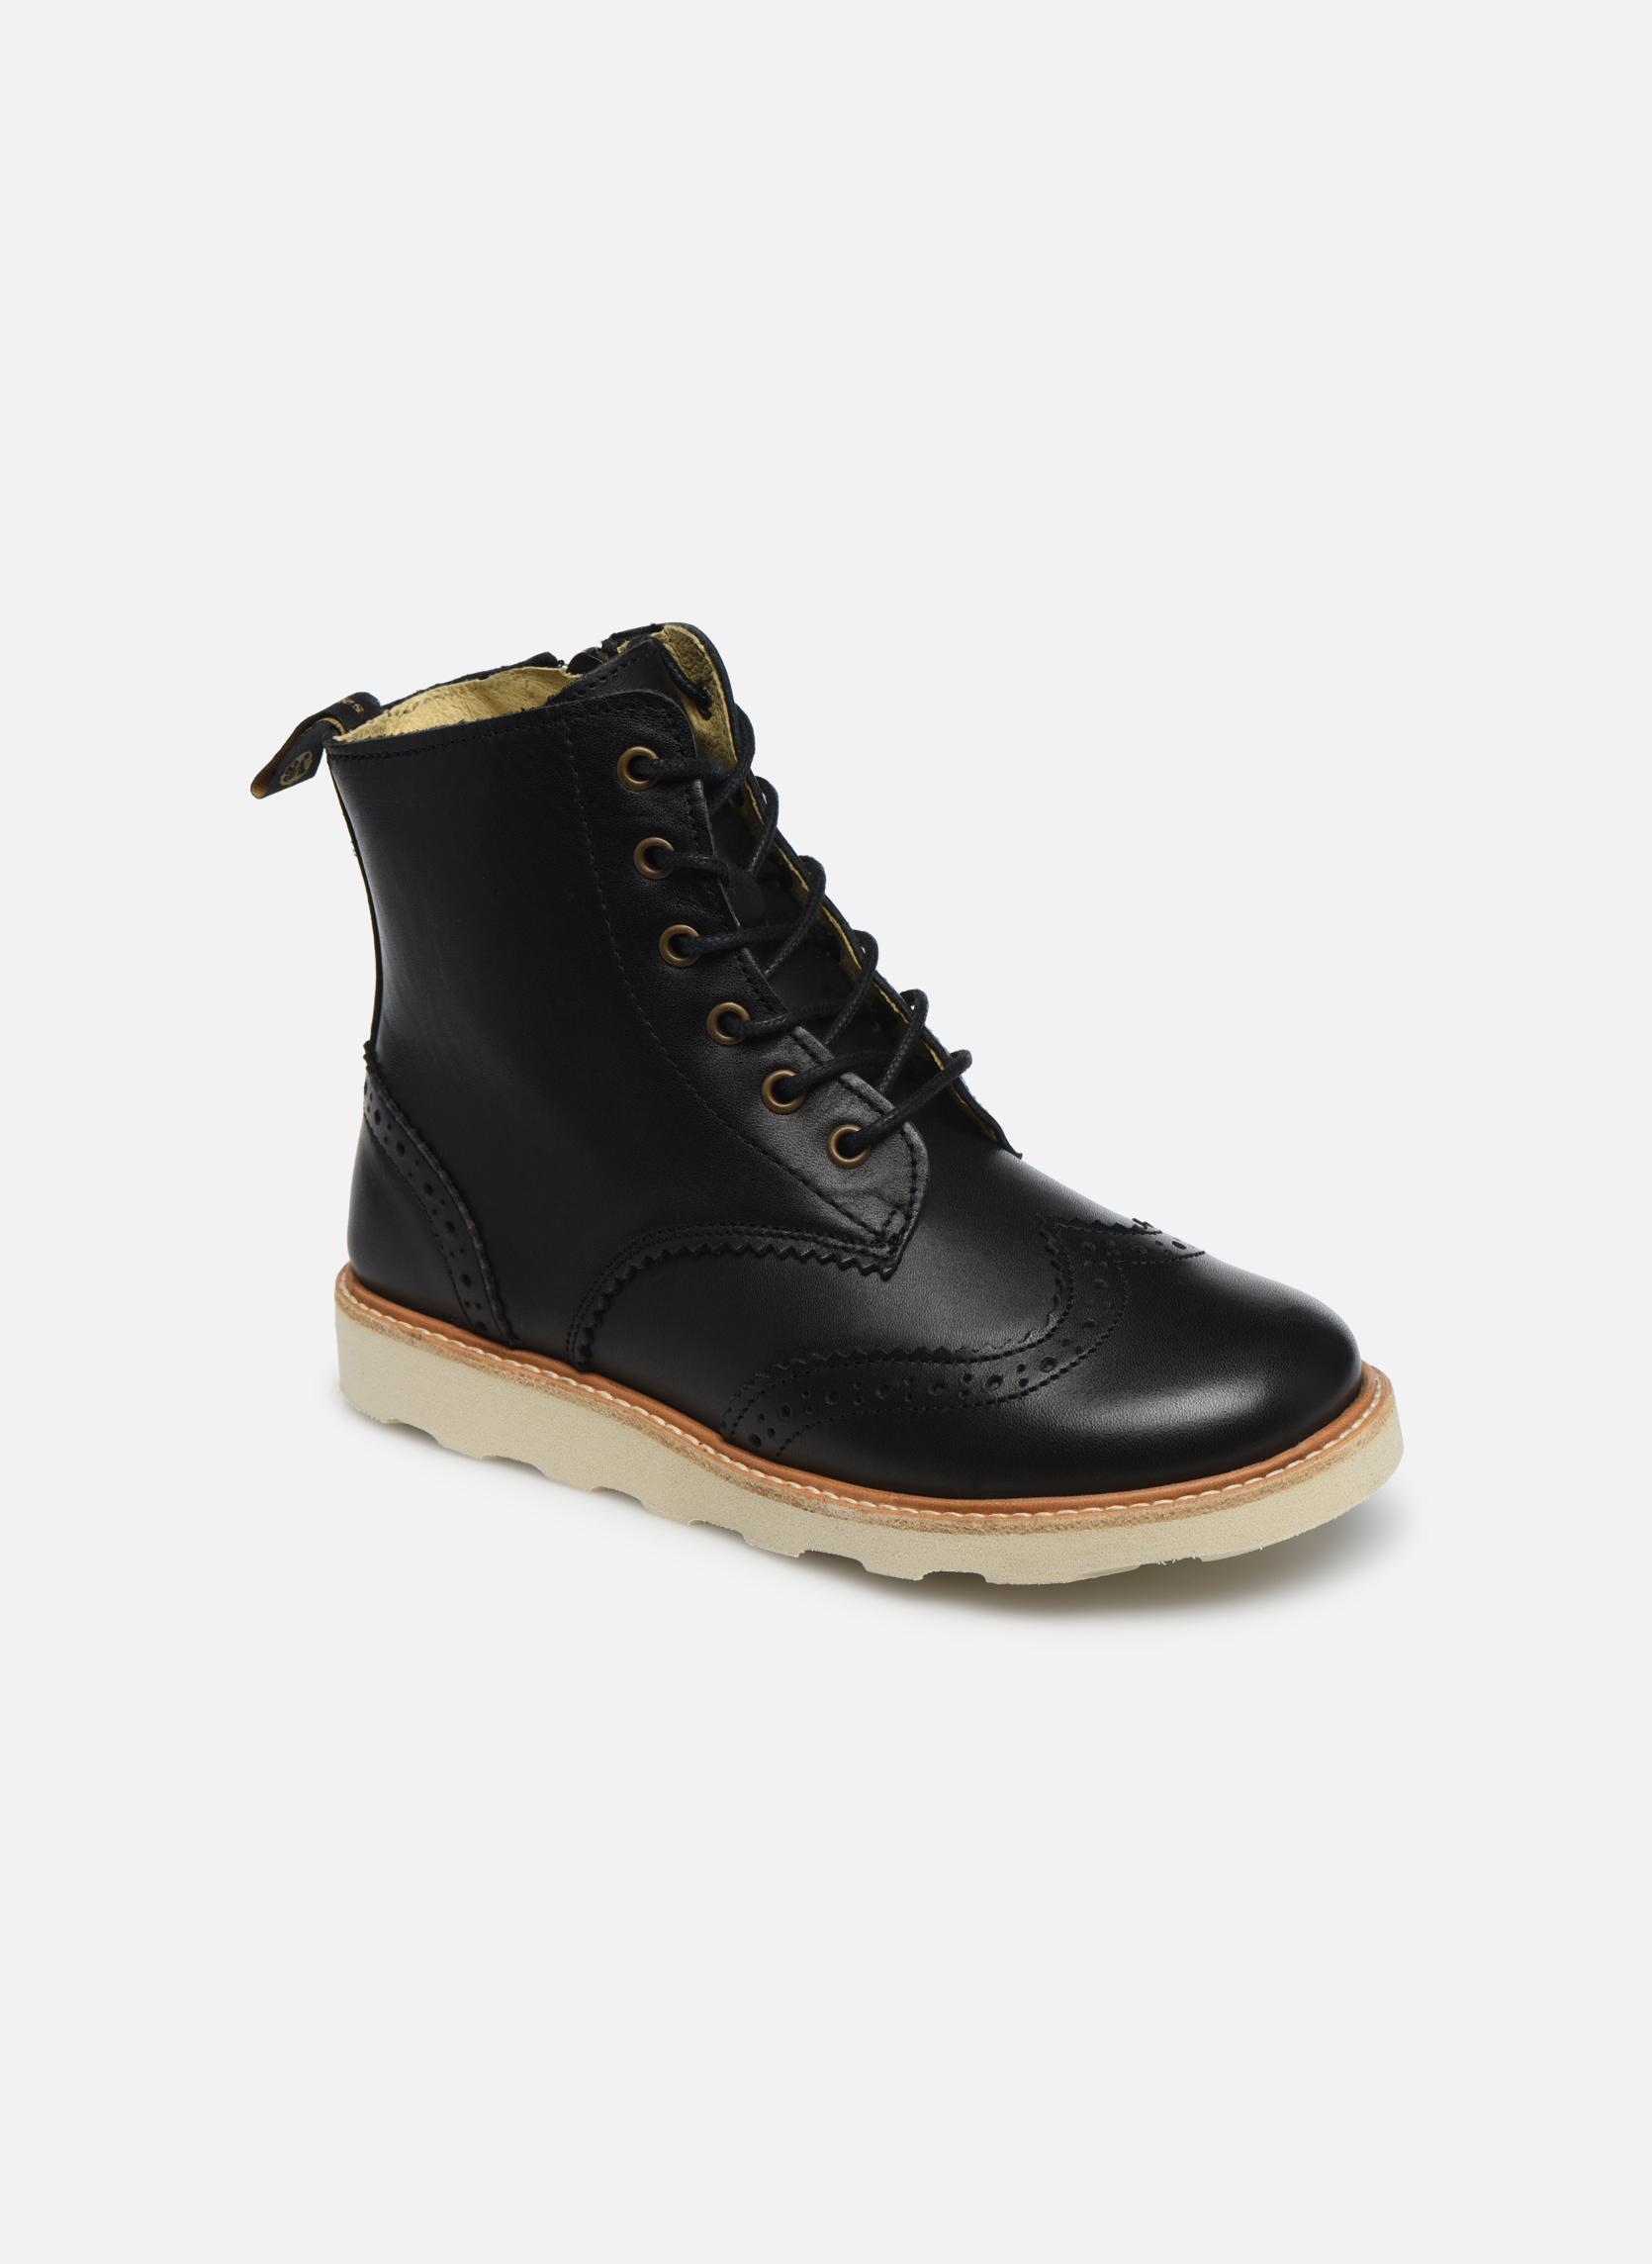 Sidney Black leather